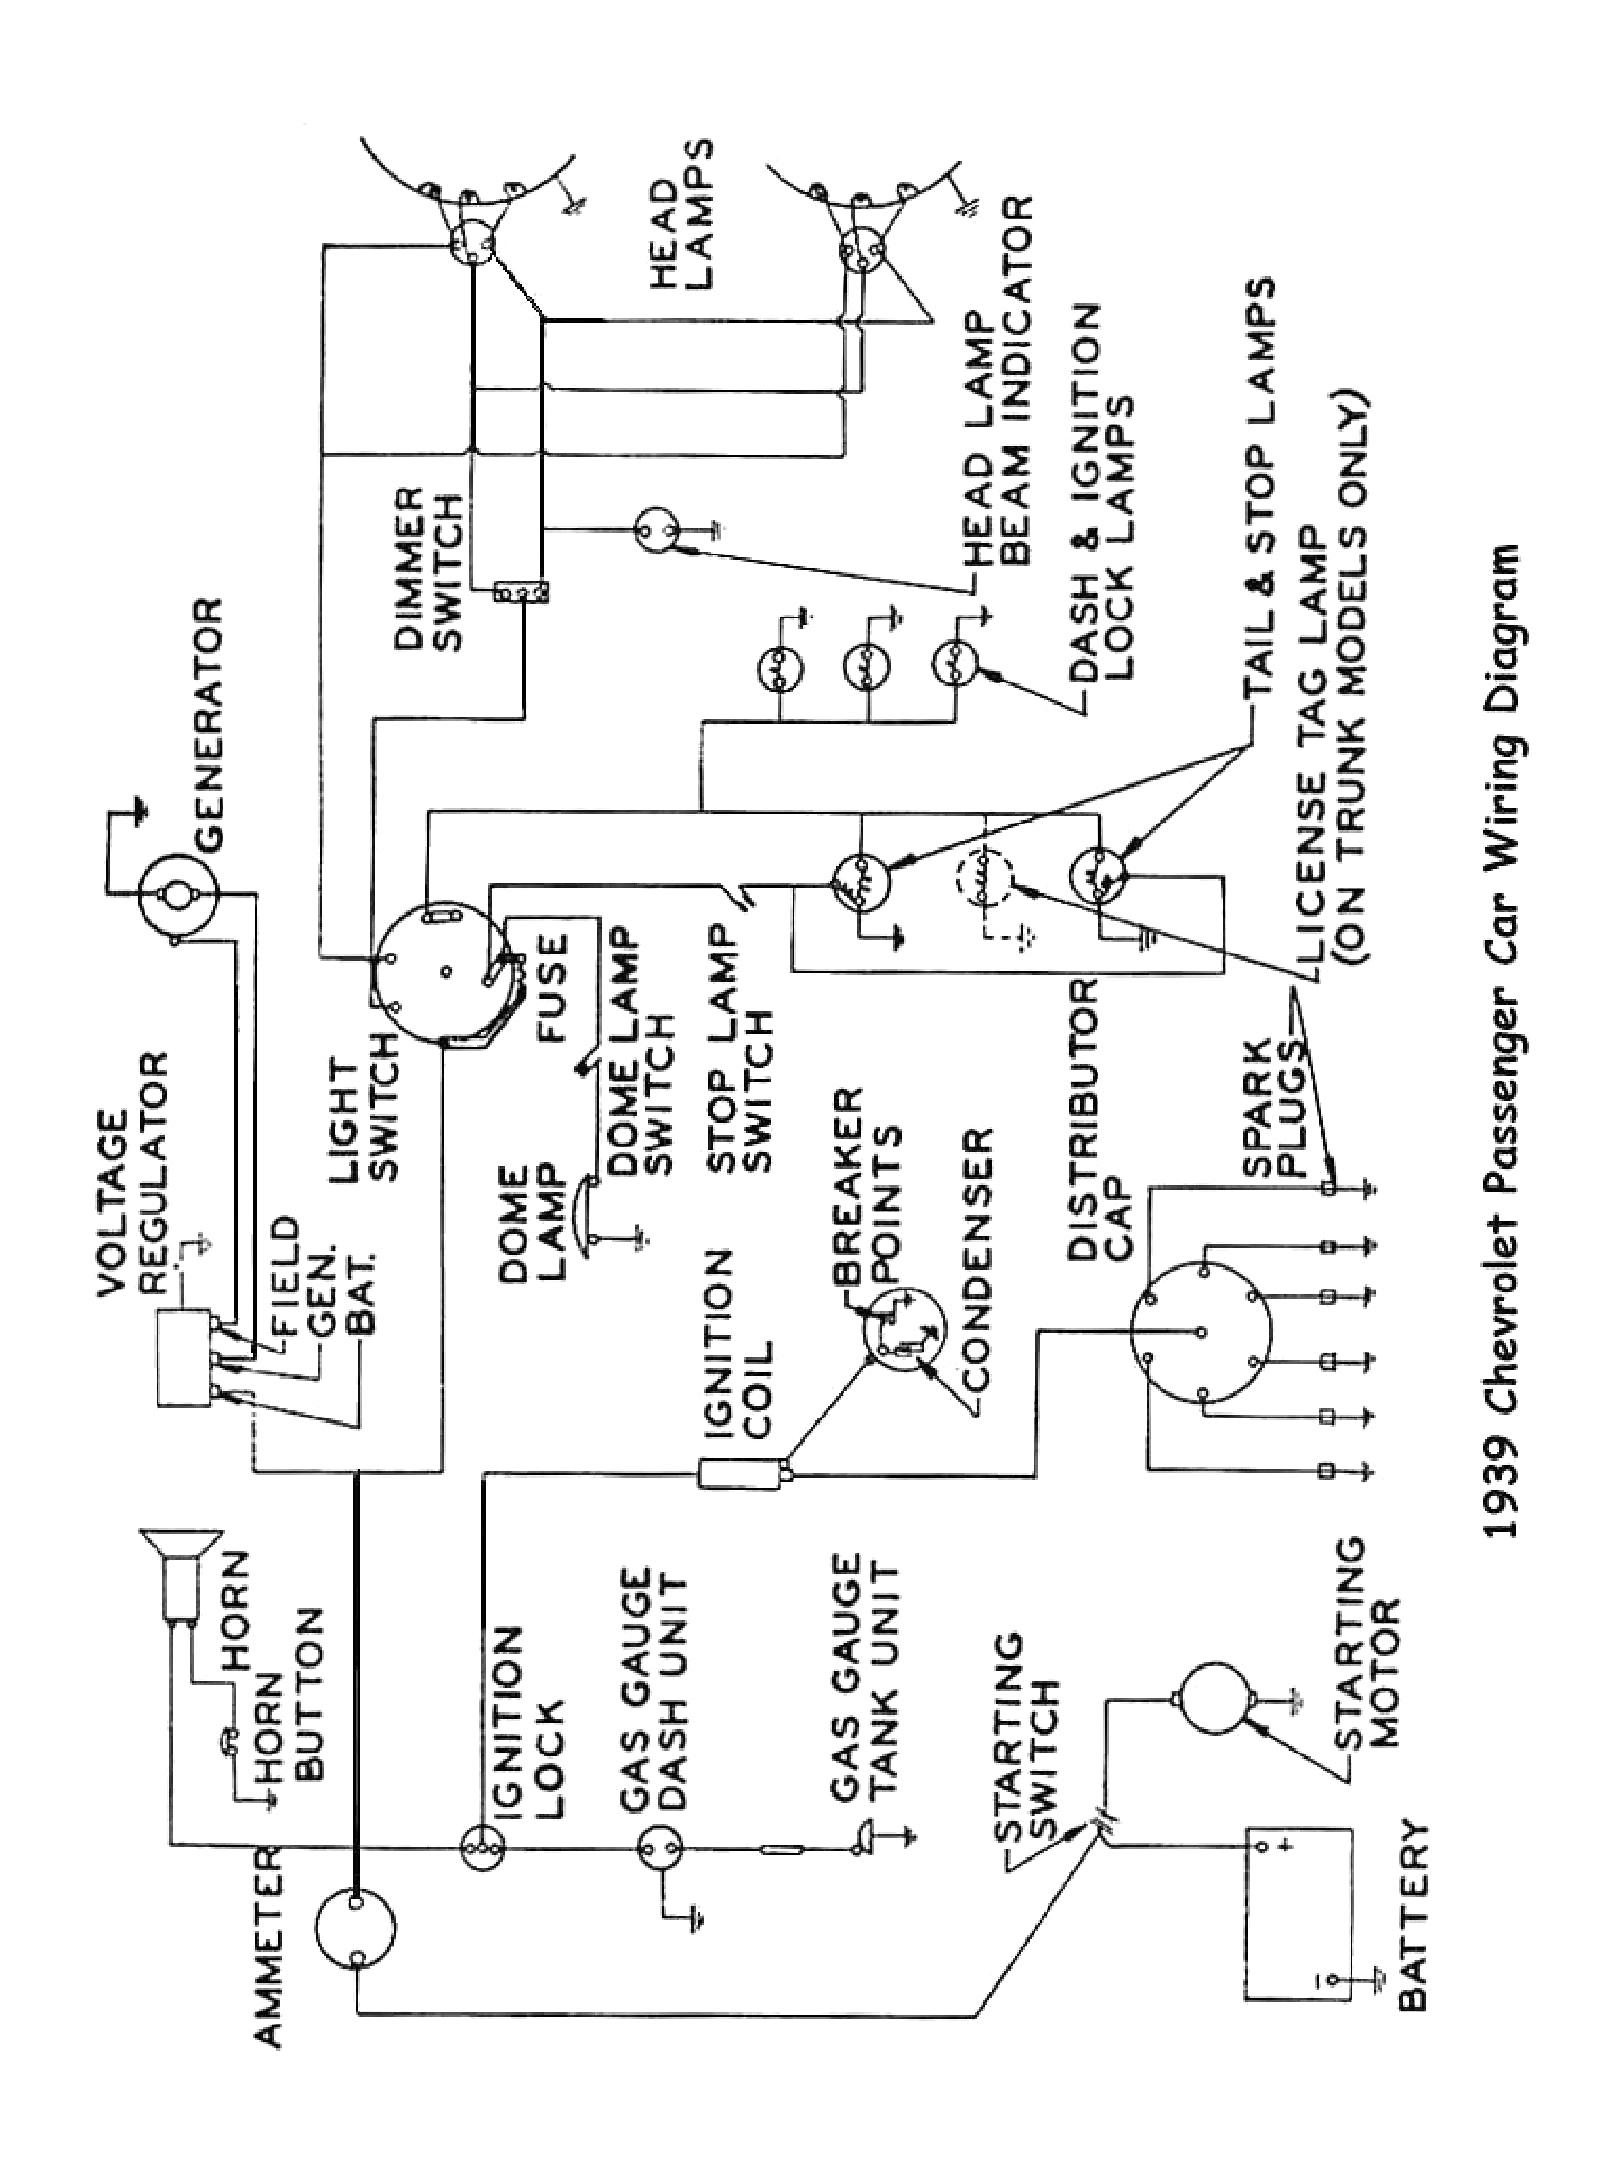 Low Voltage Outdoor Lighting Wiring Diagram - Deltagenerali - Low Voltage Landscape Lighting Wiring Diagram